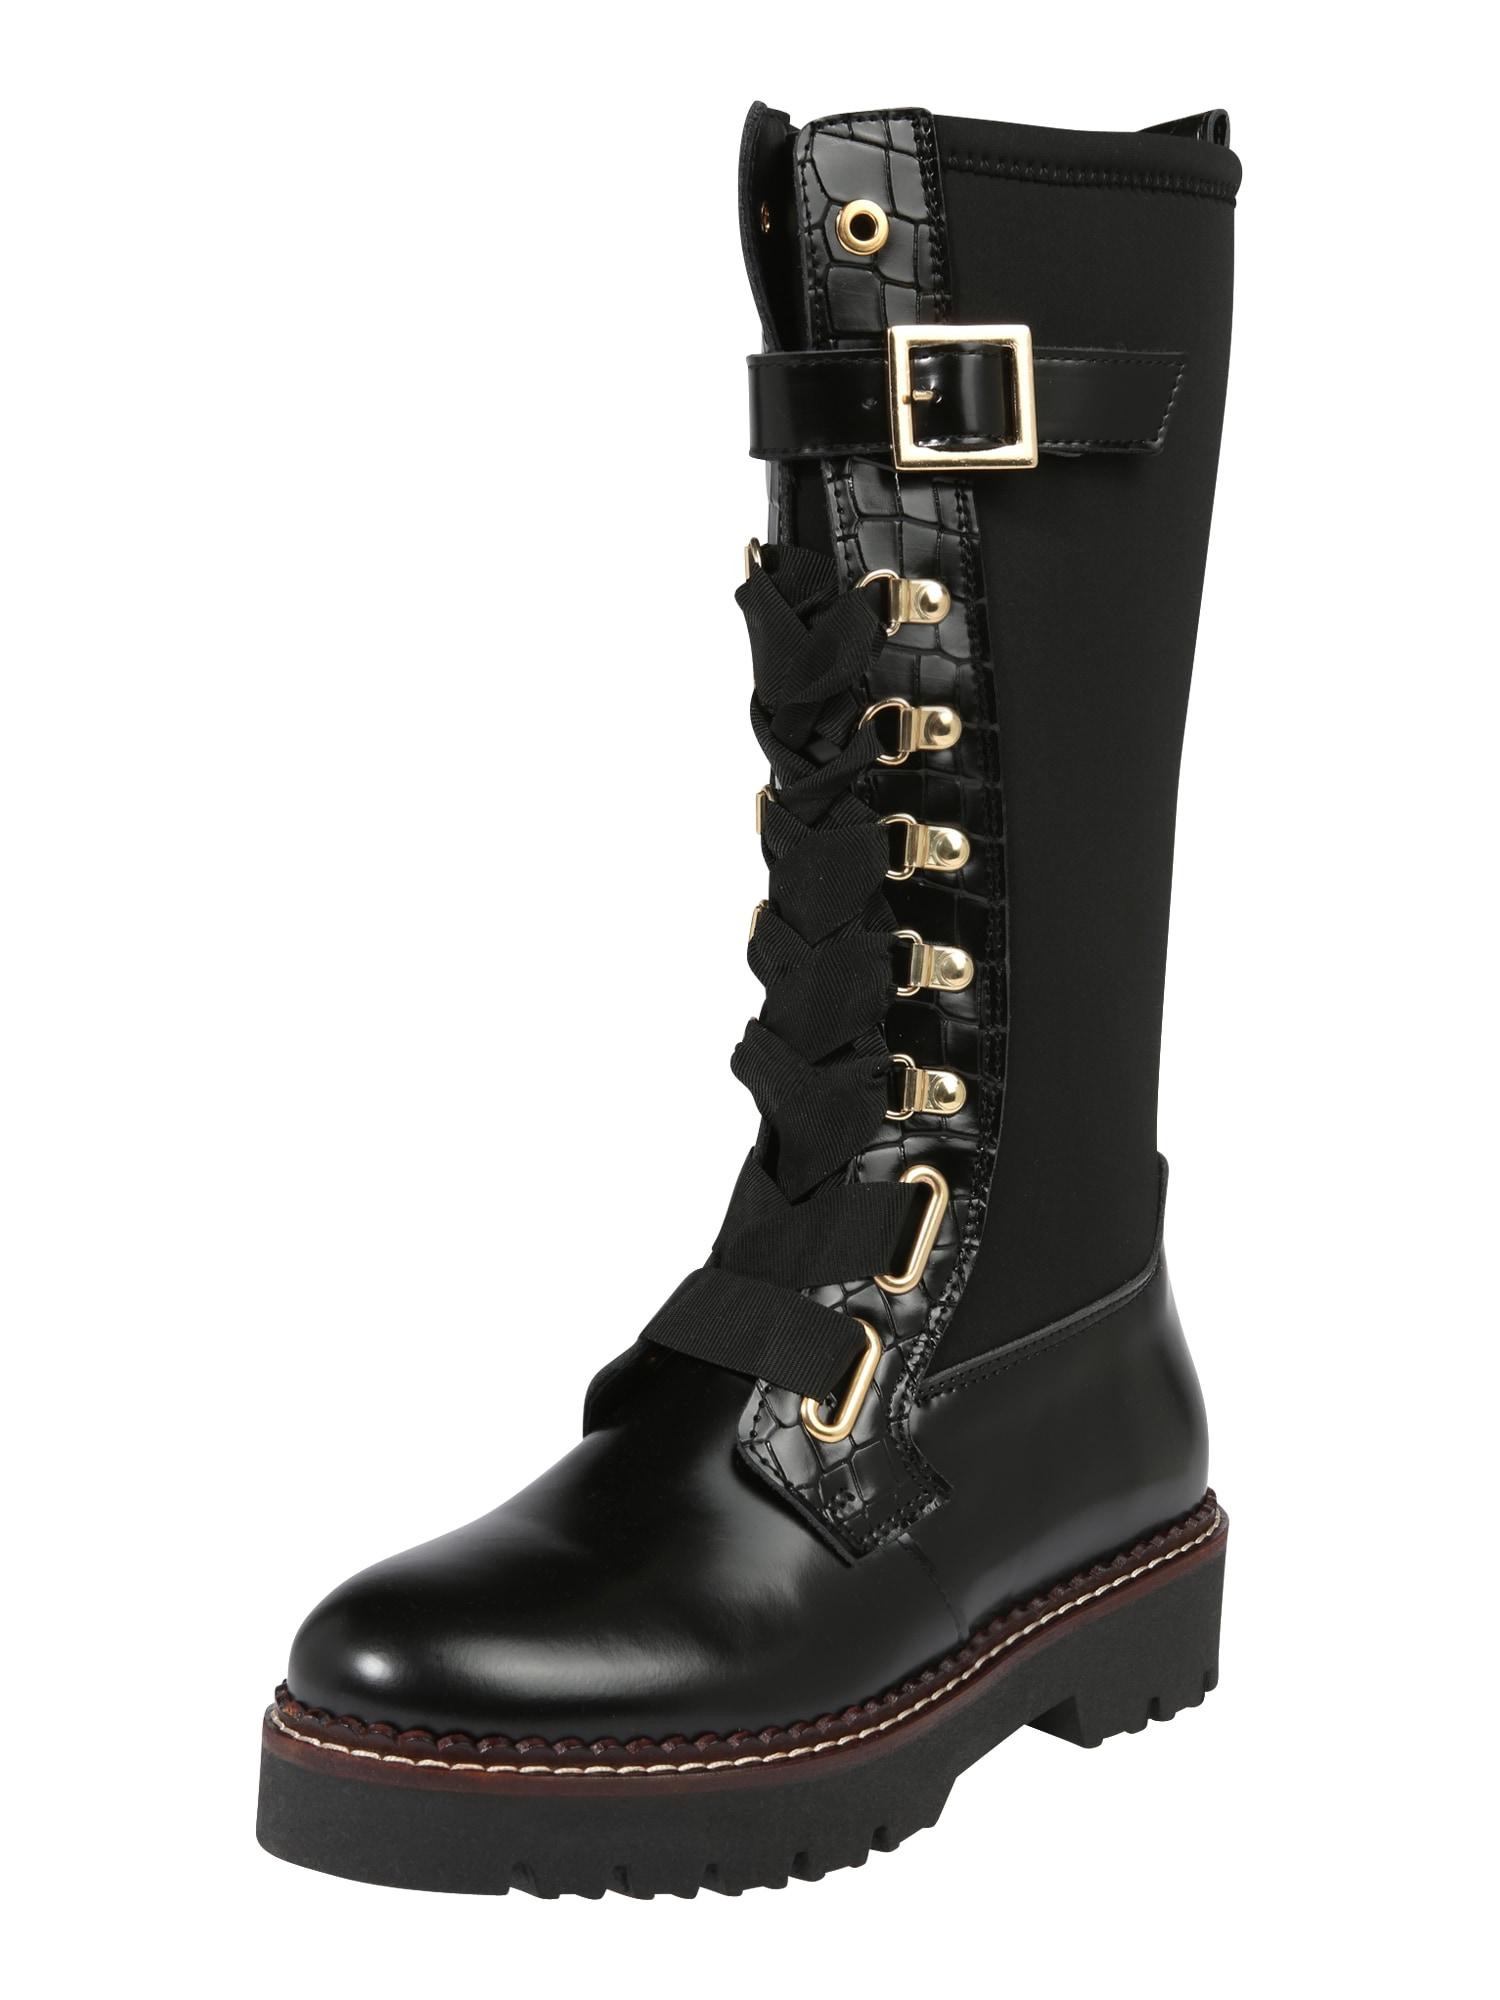 SCOTCH & SODA Suvarstomieji batai 'Olivine' juoda